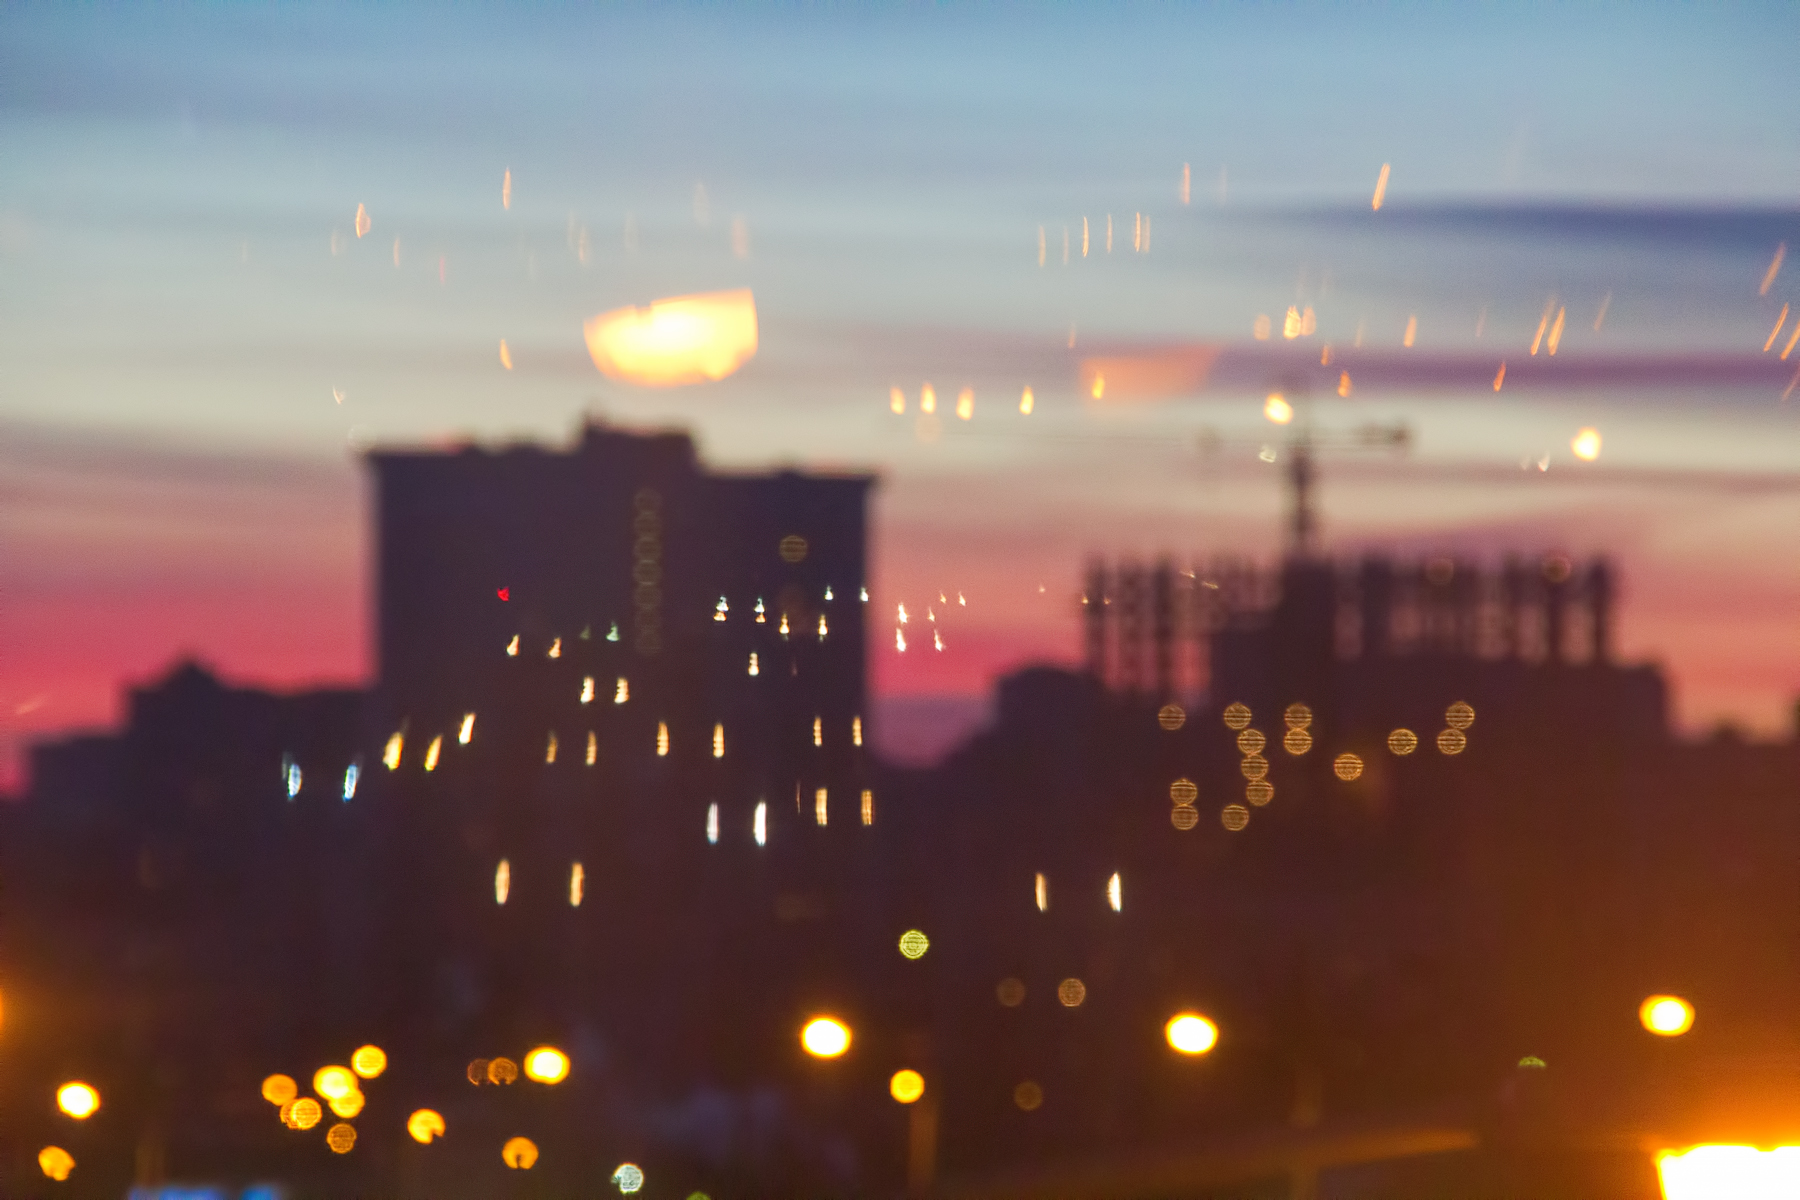 stockvault-city-reflections155477.jpg